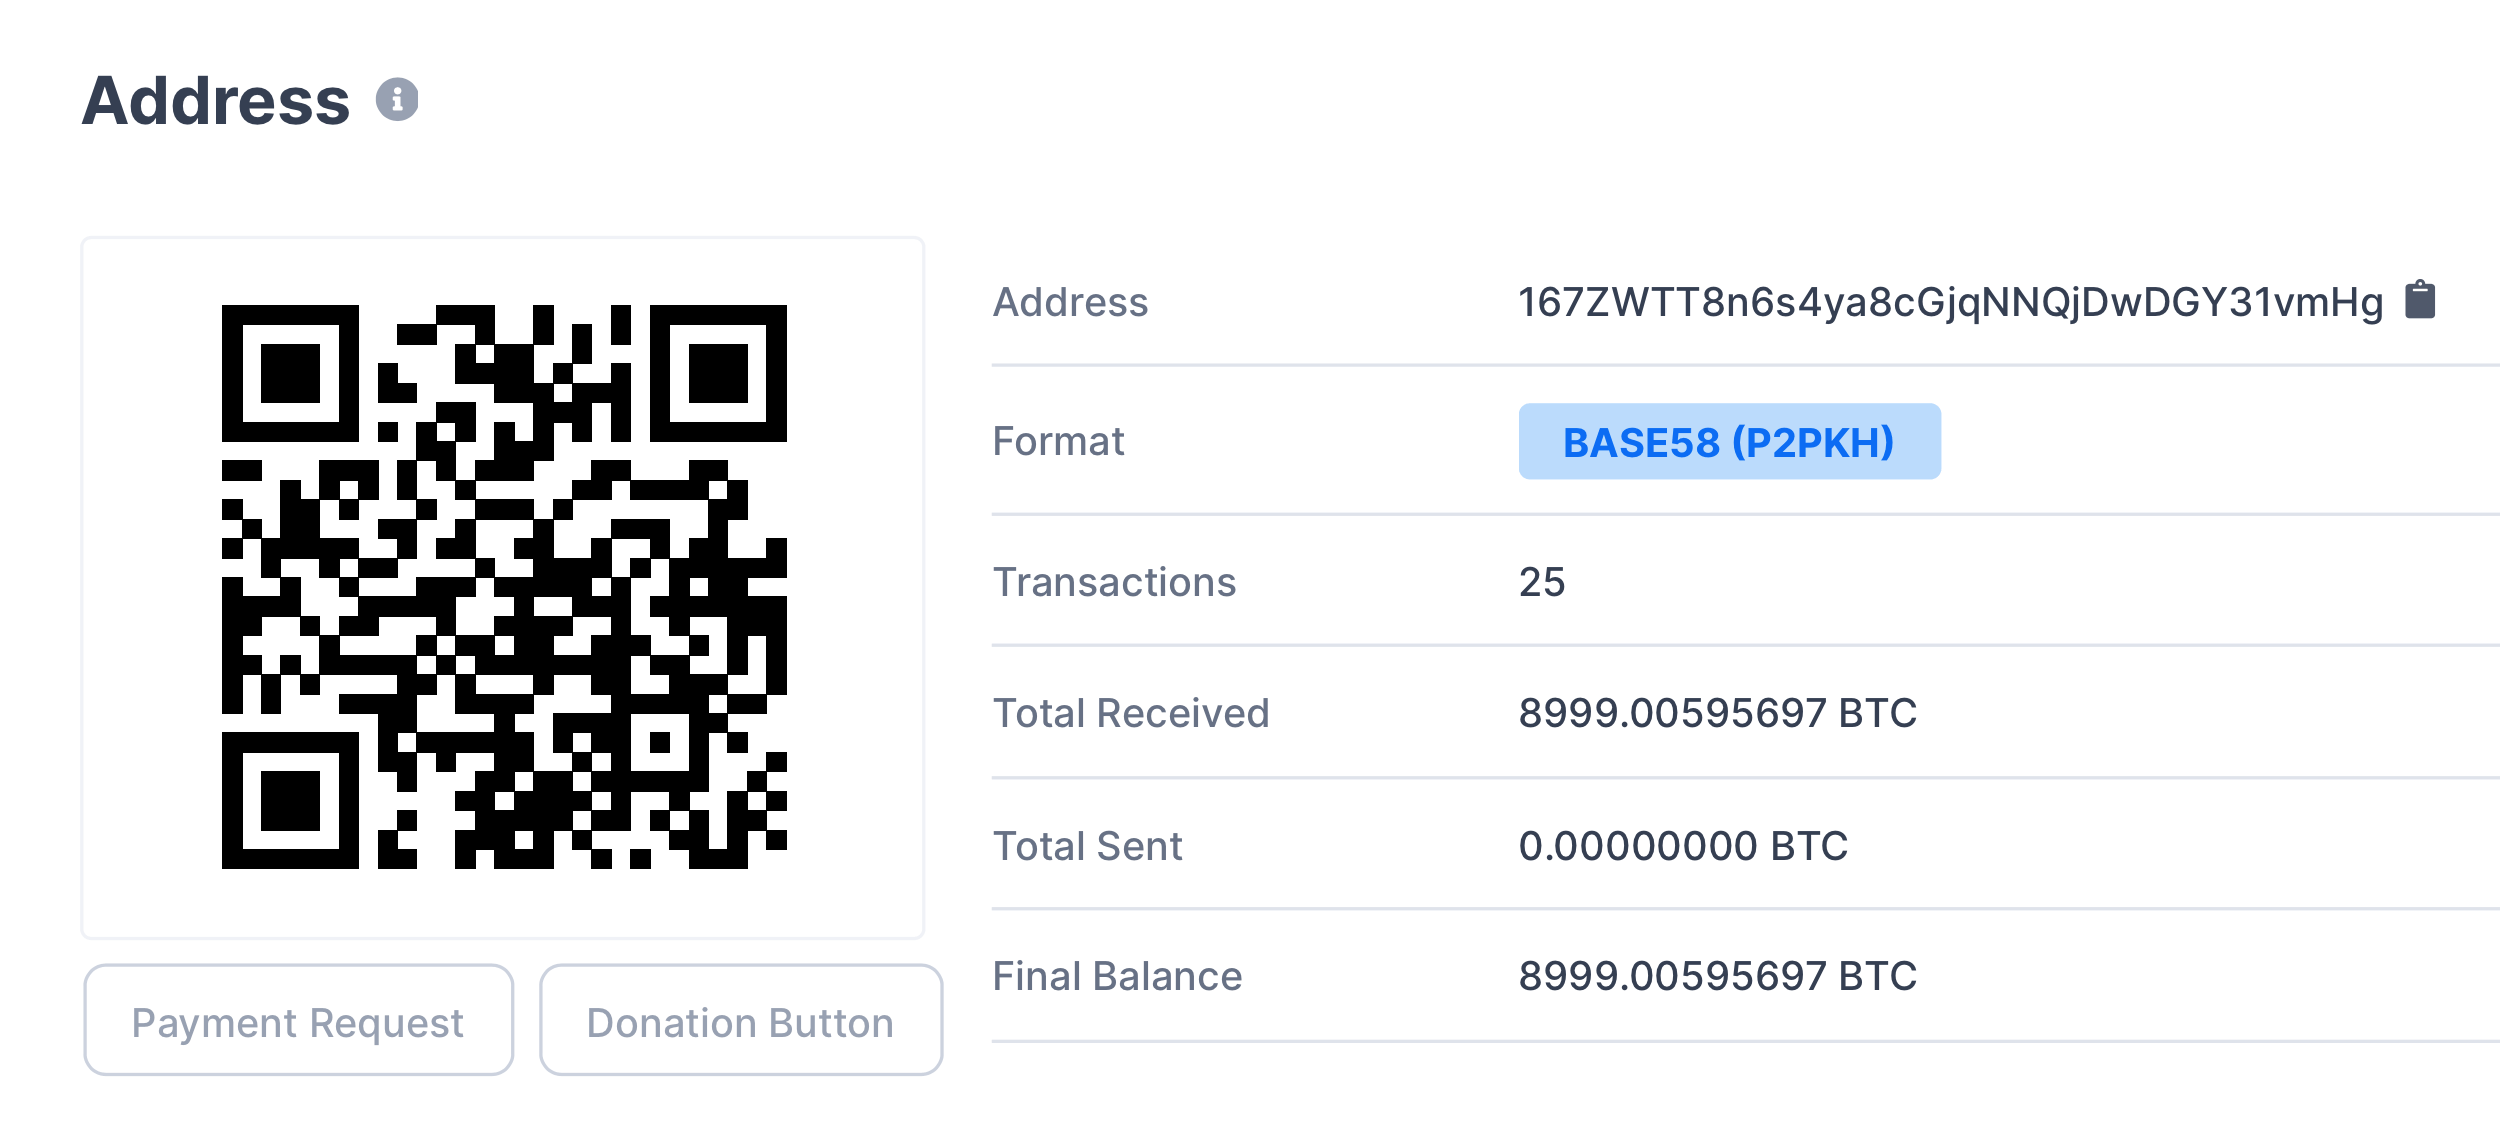 биткоин адрес криптовалюты